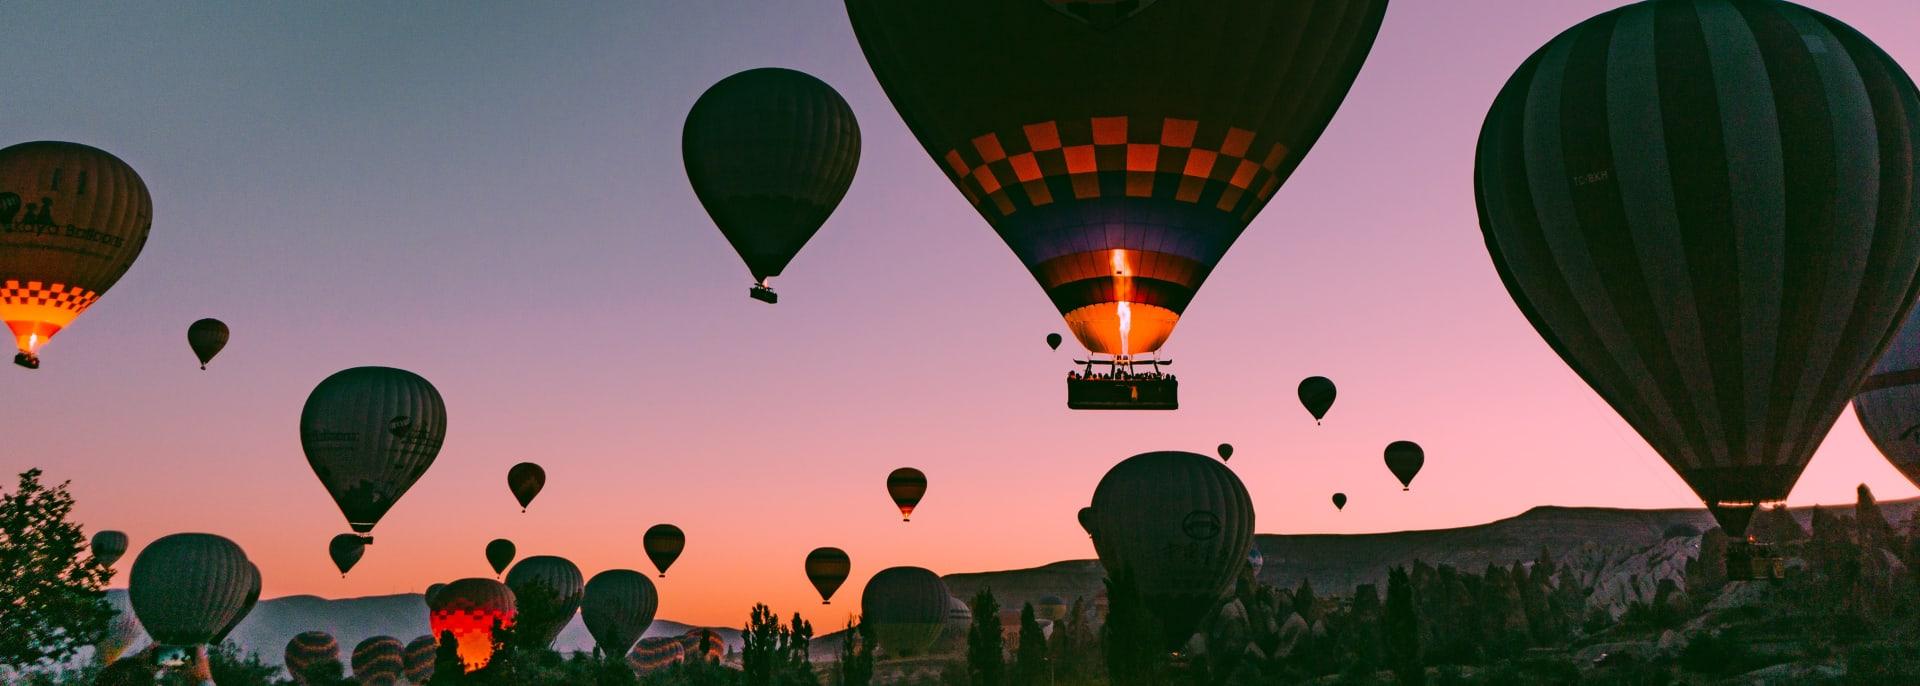 Ballon Festival, Türkei